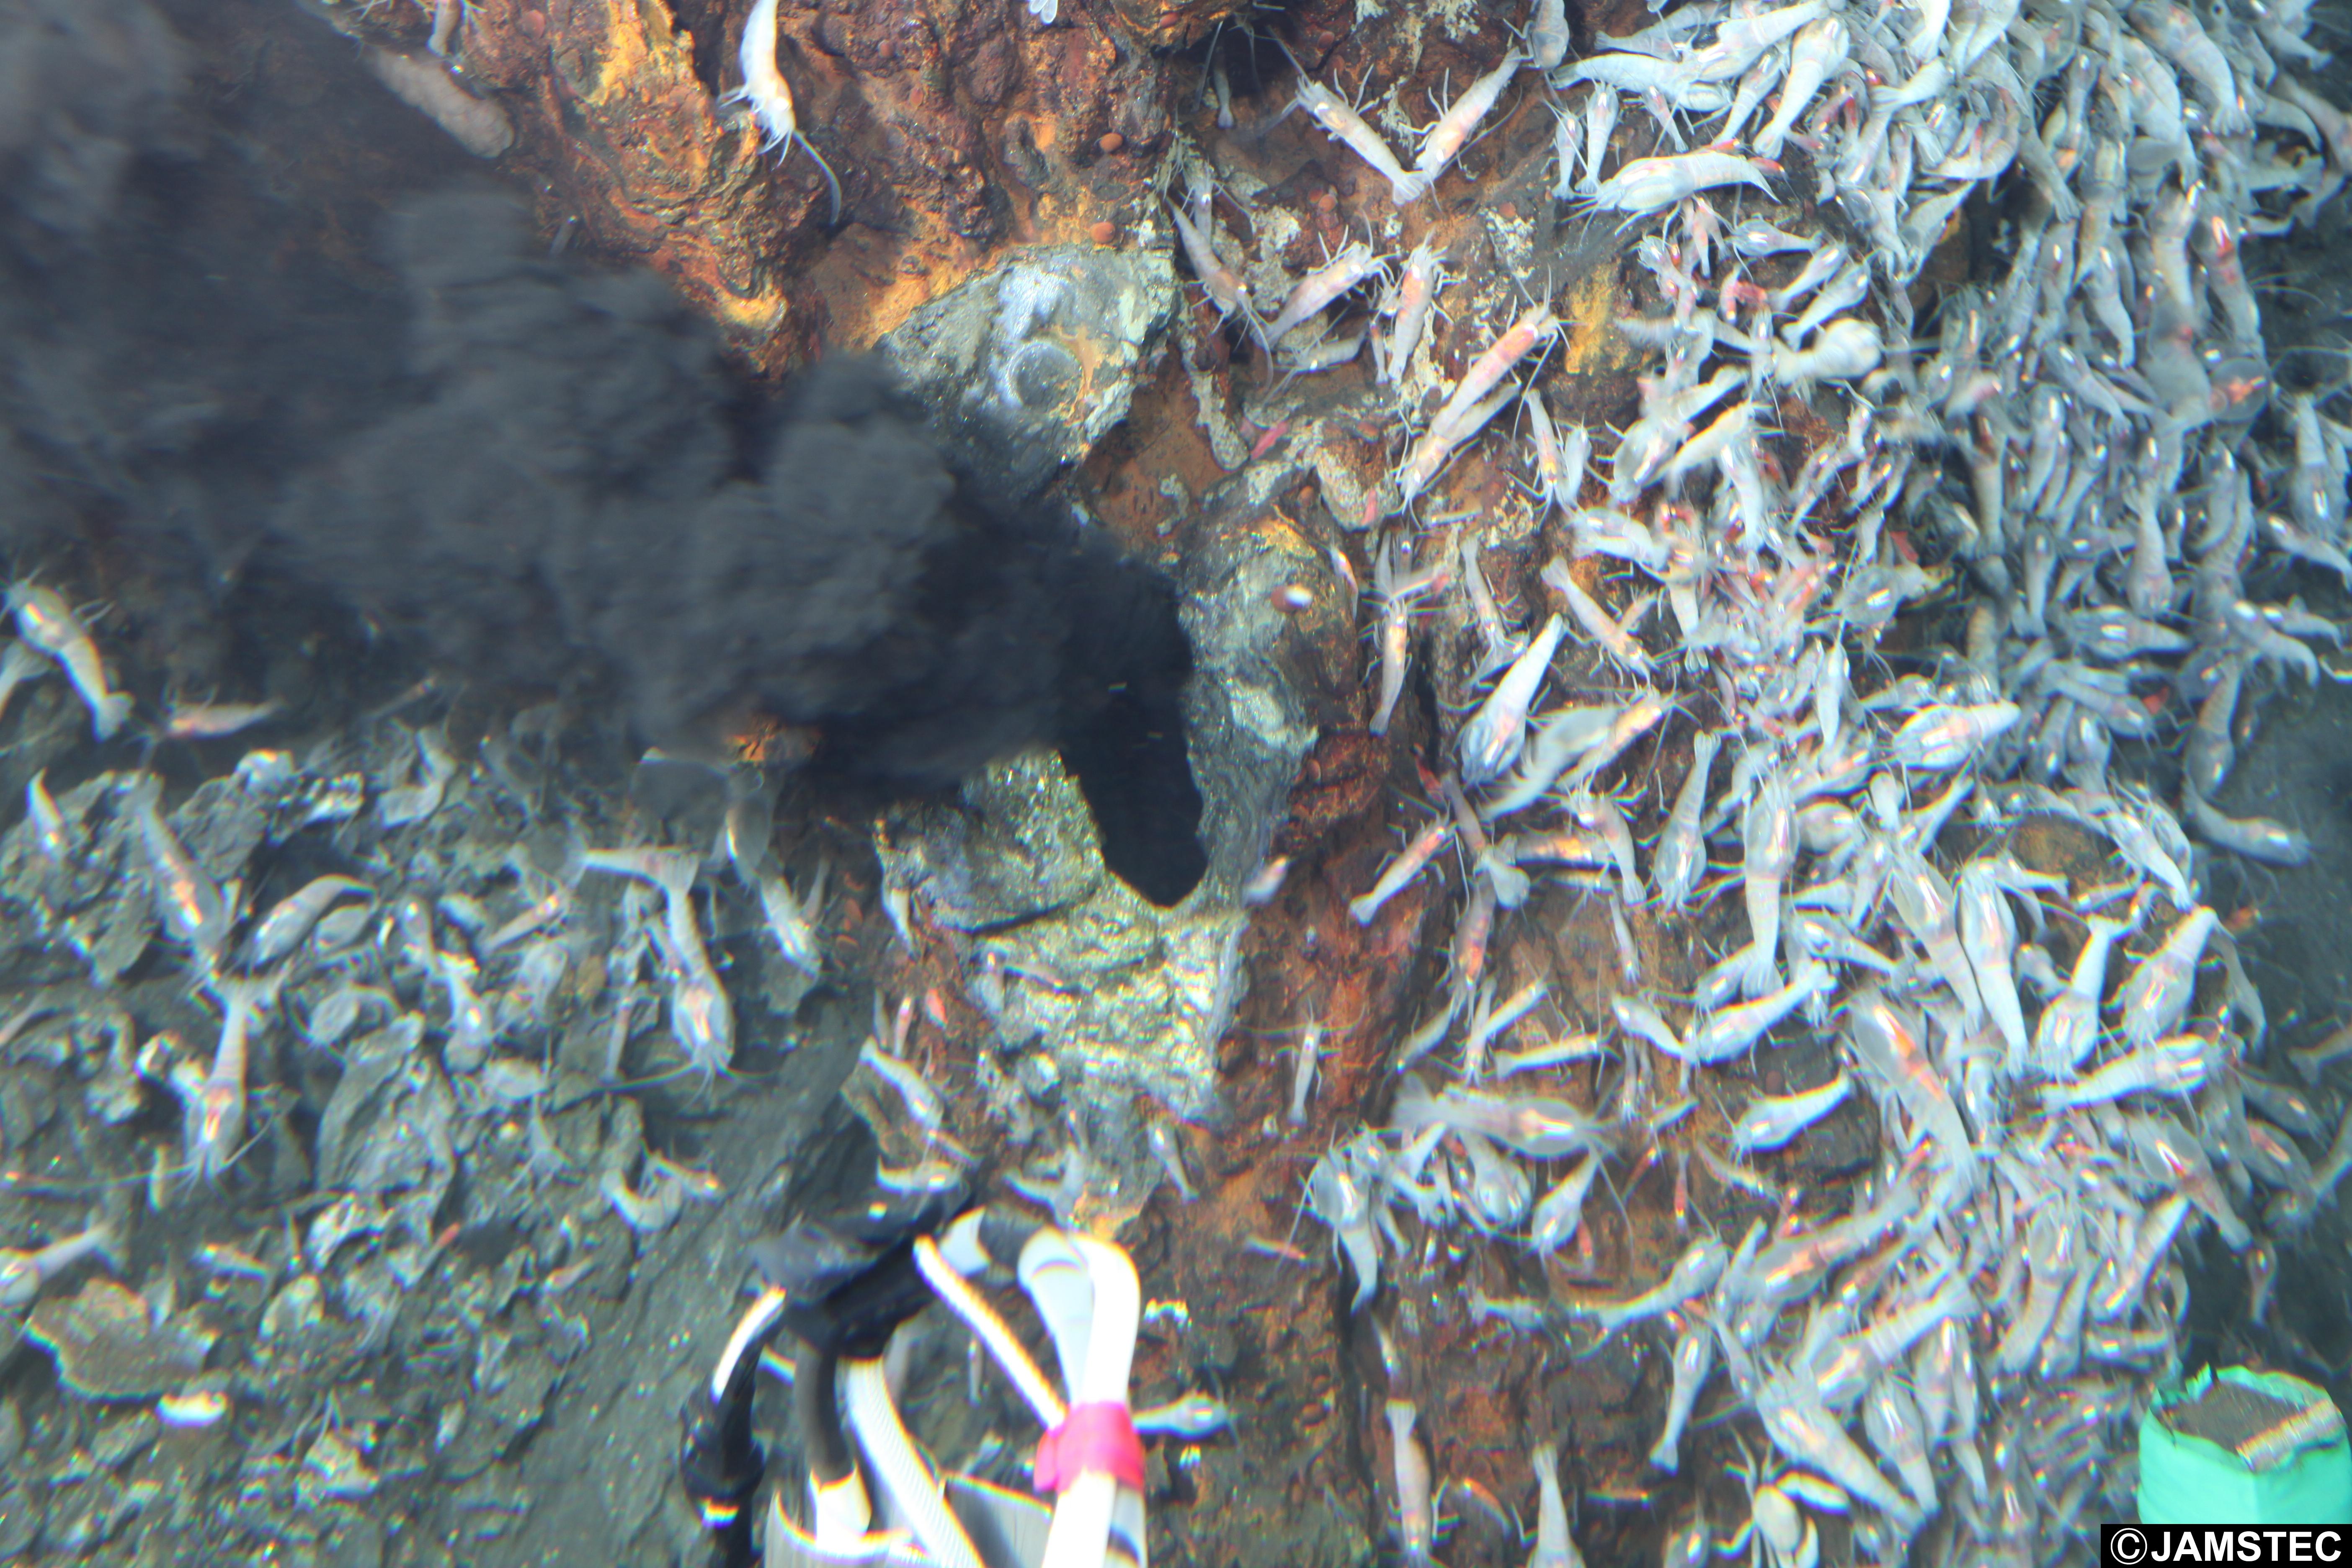 Hydrothermal vent (Photo Credit: JAMSTEC)